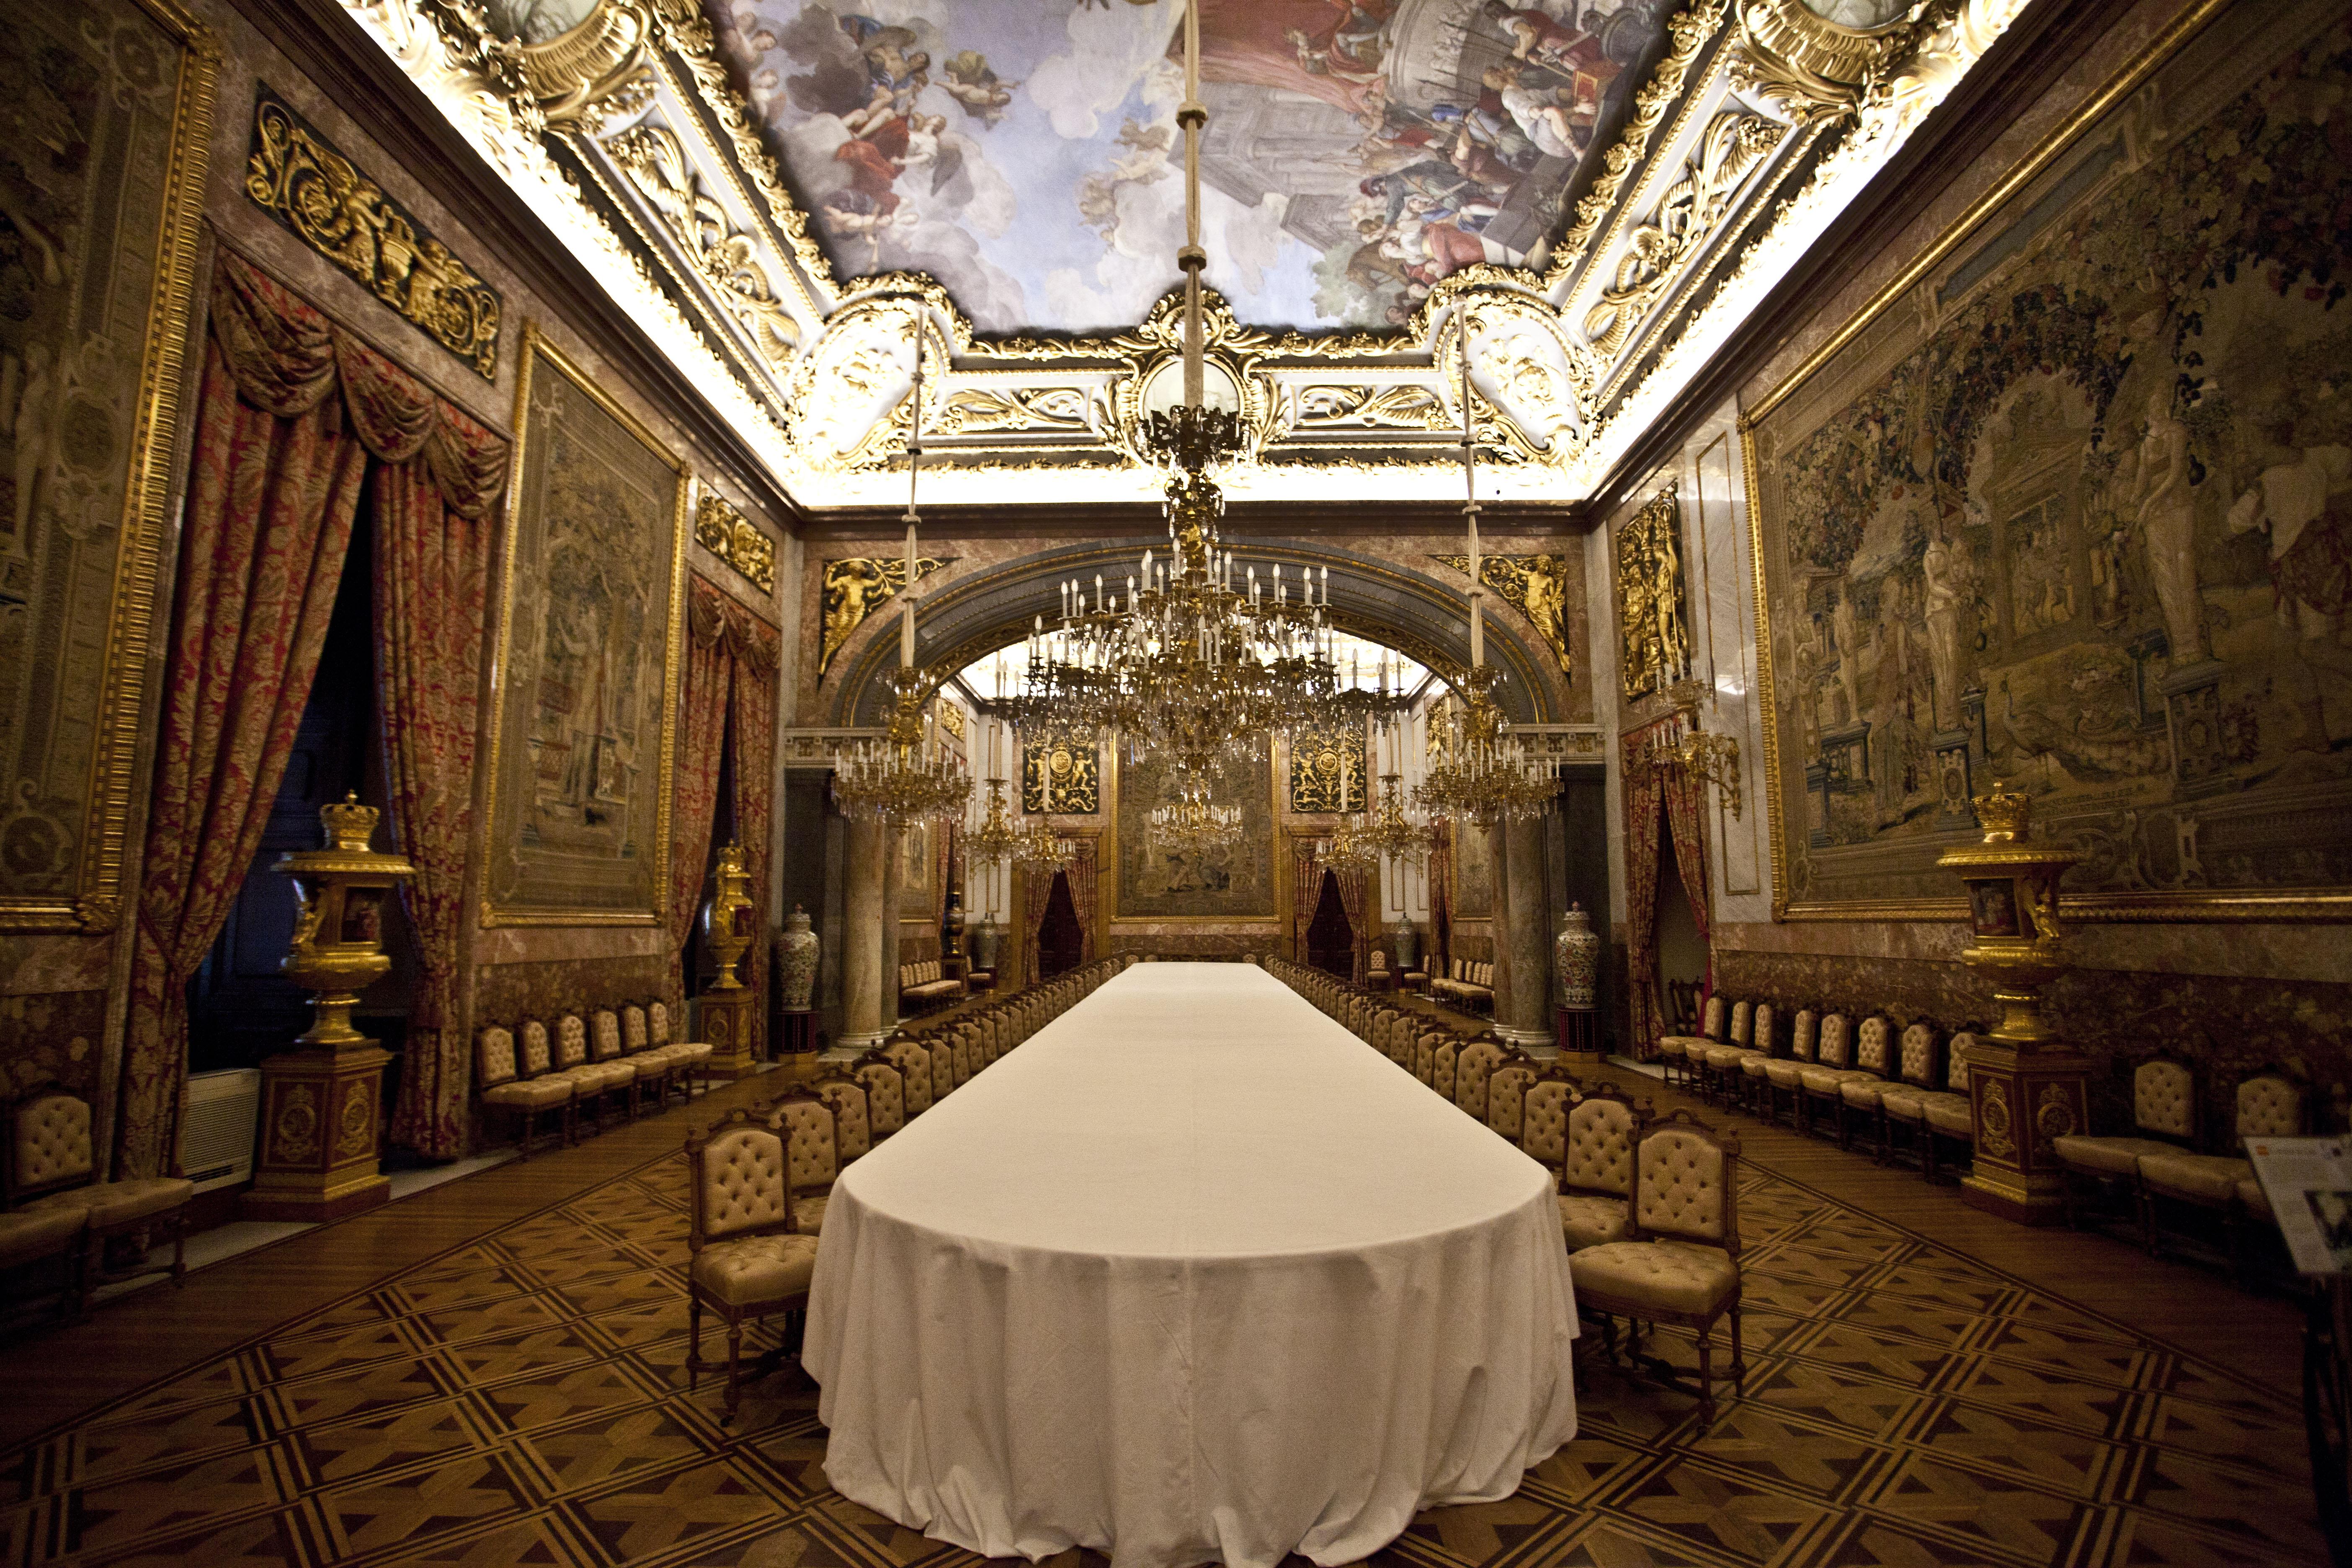 королевский дворец в мадриде внутри